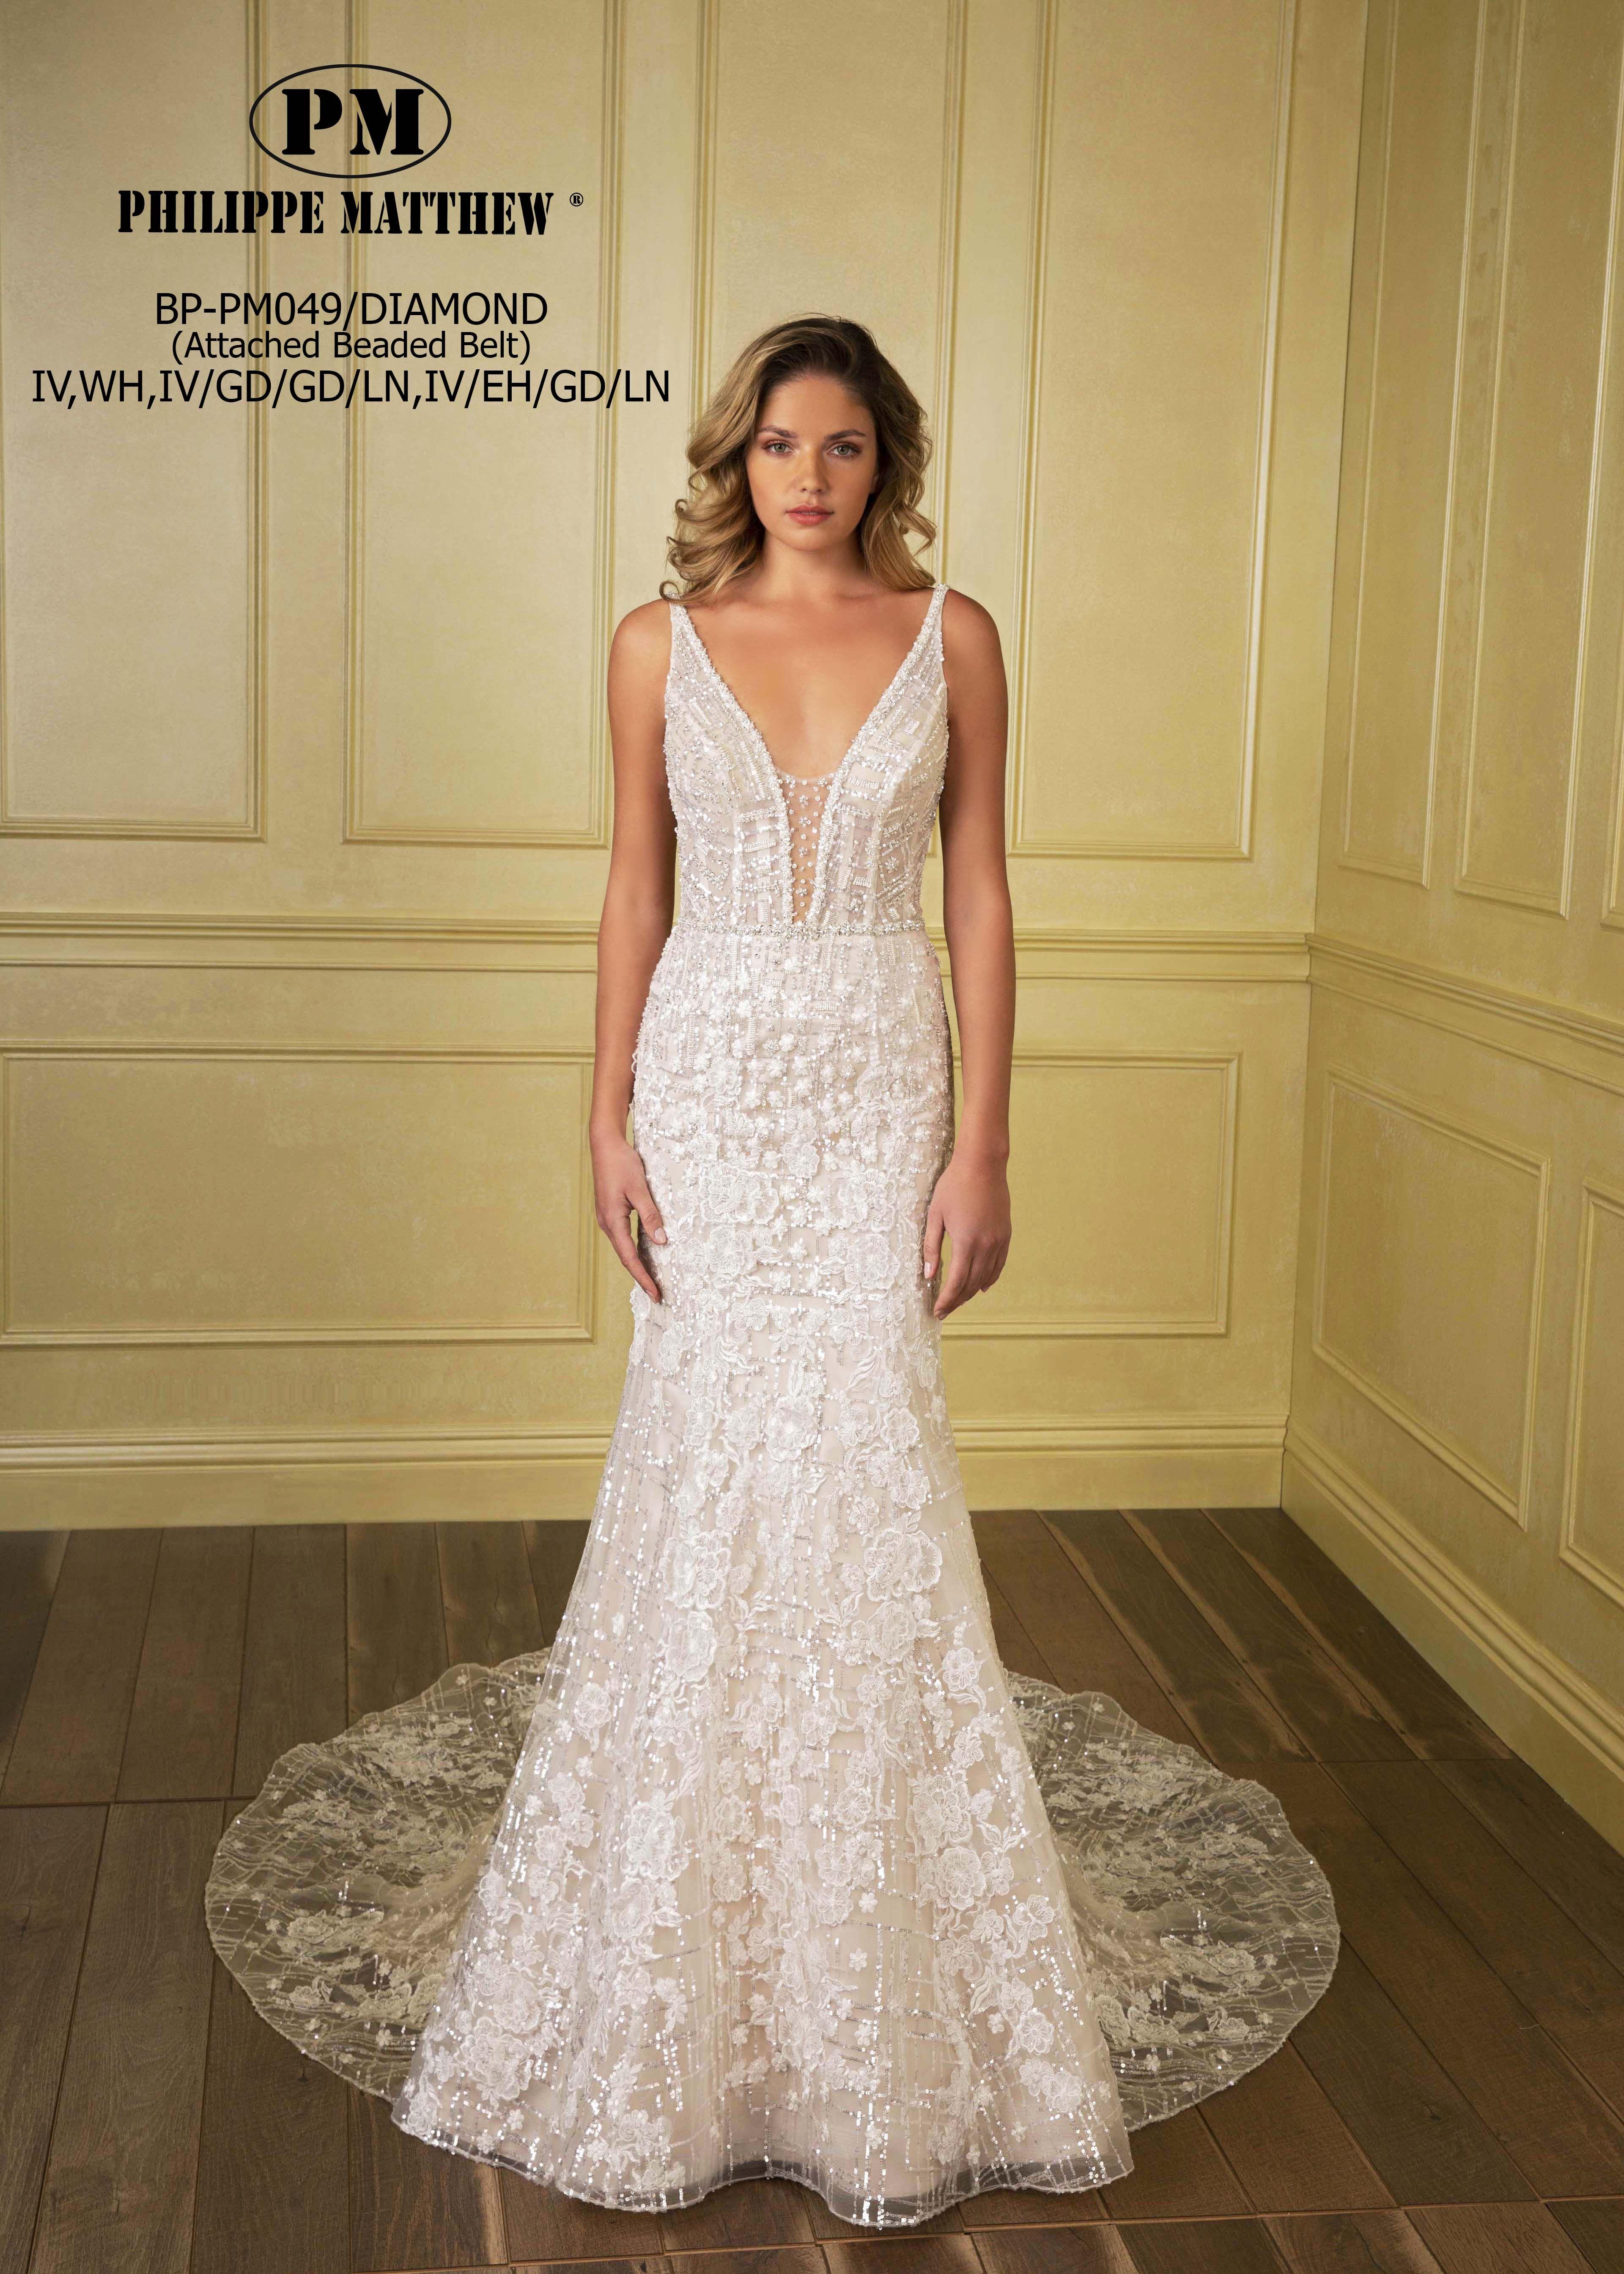 DIAMOND from PHILIPPE MATTHEW Wedding dresses lace